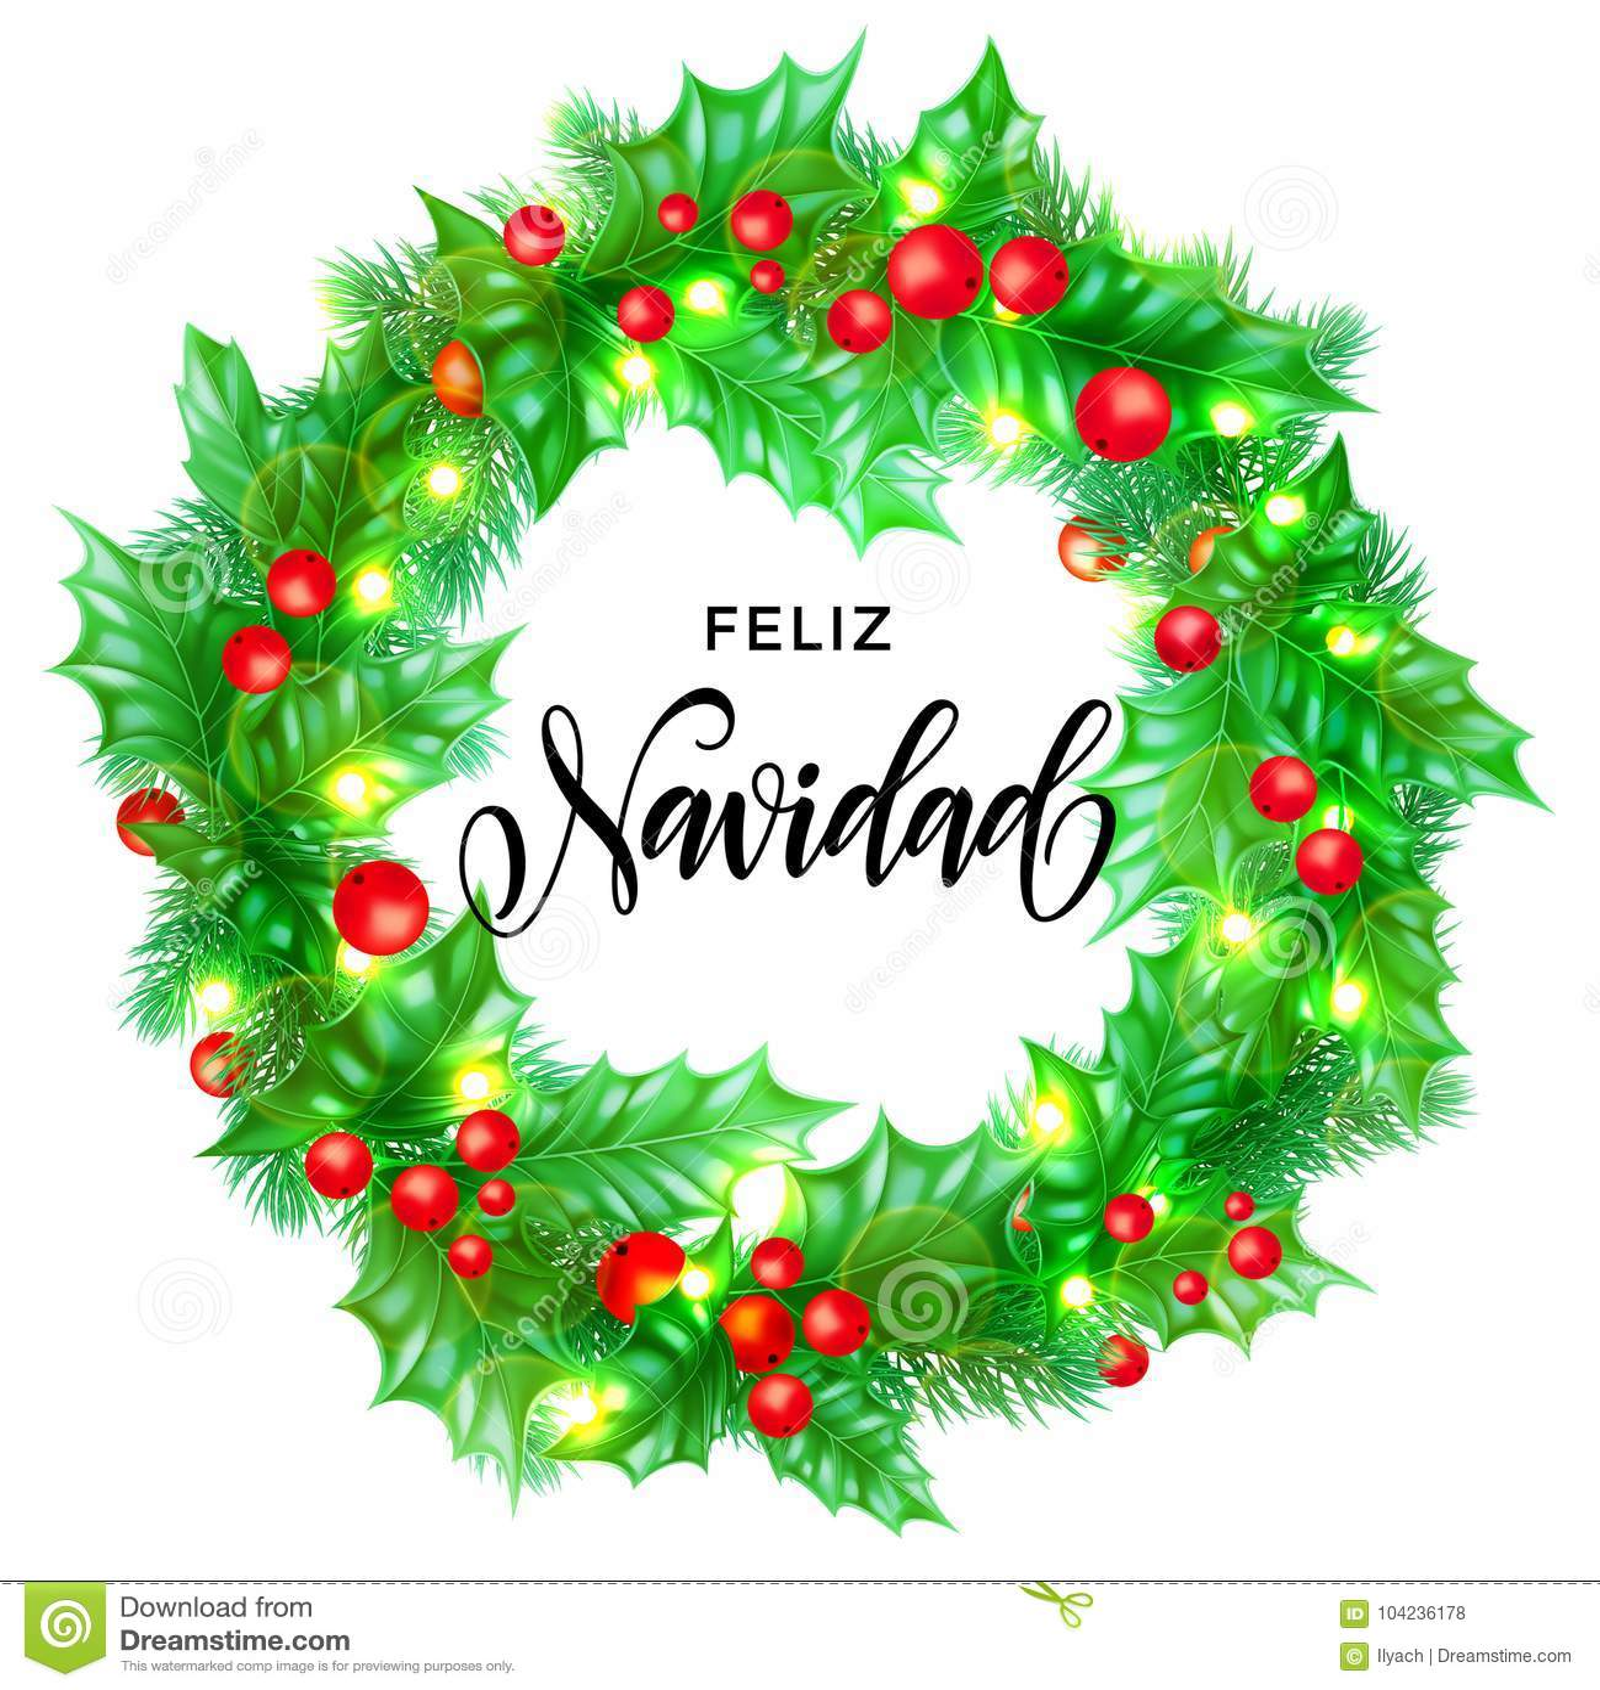 Feliz Navidad Spanish Merry Christmas Hand Drawn Calligraphy In